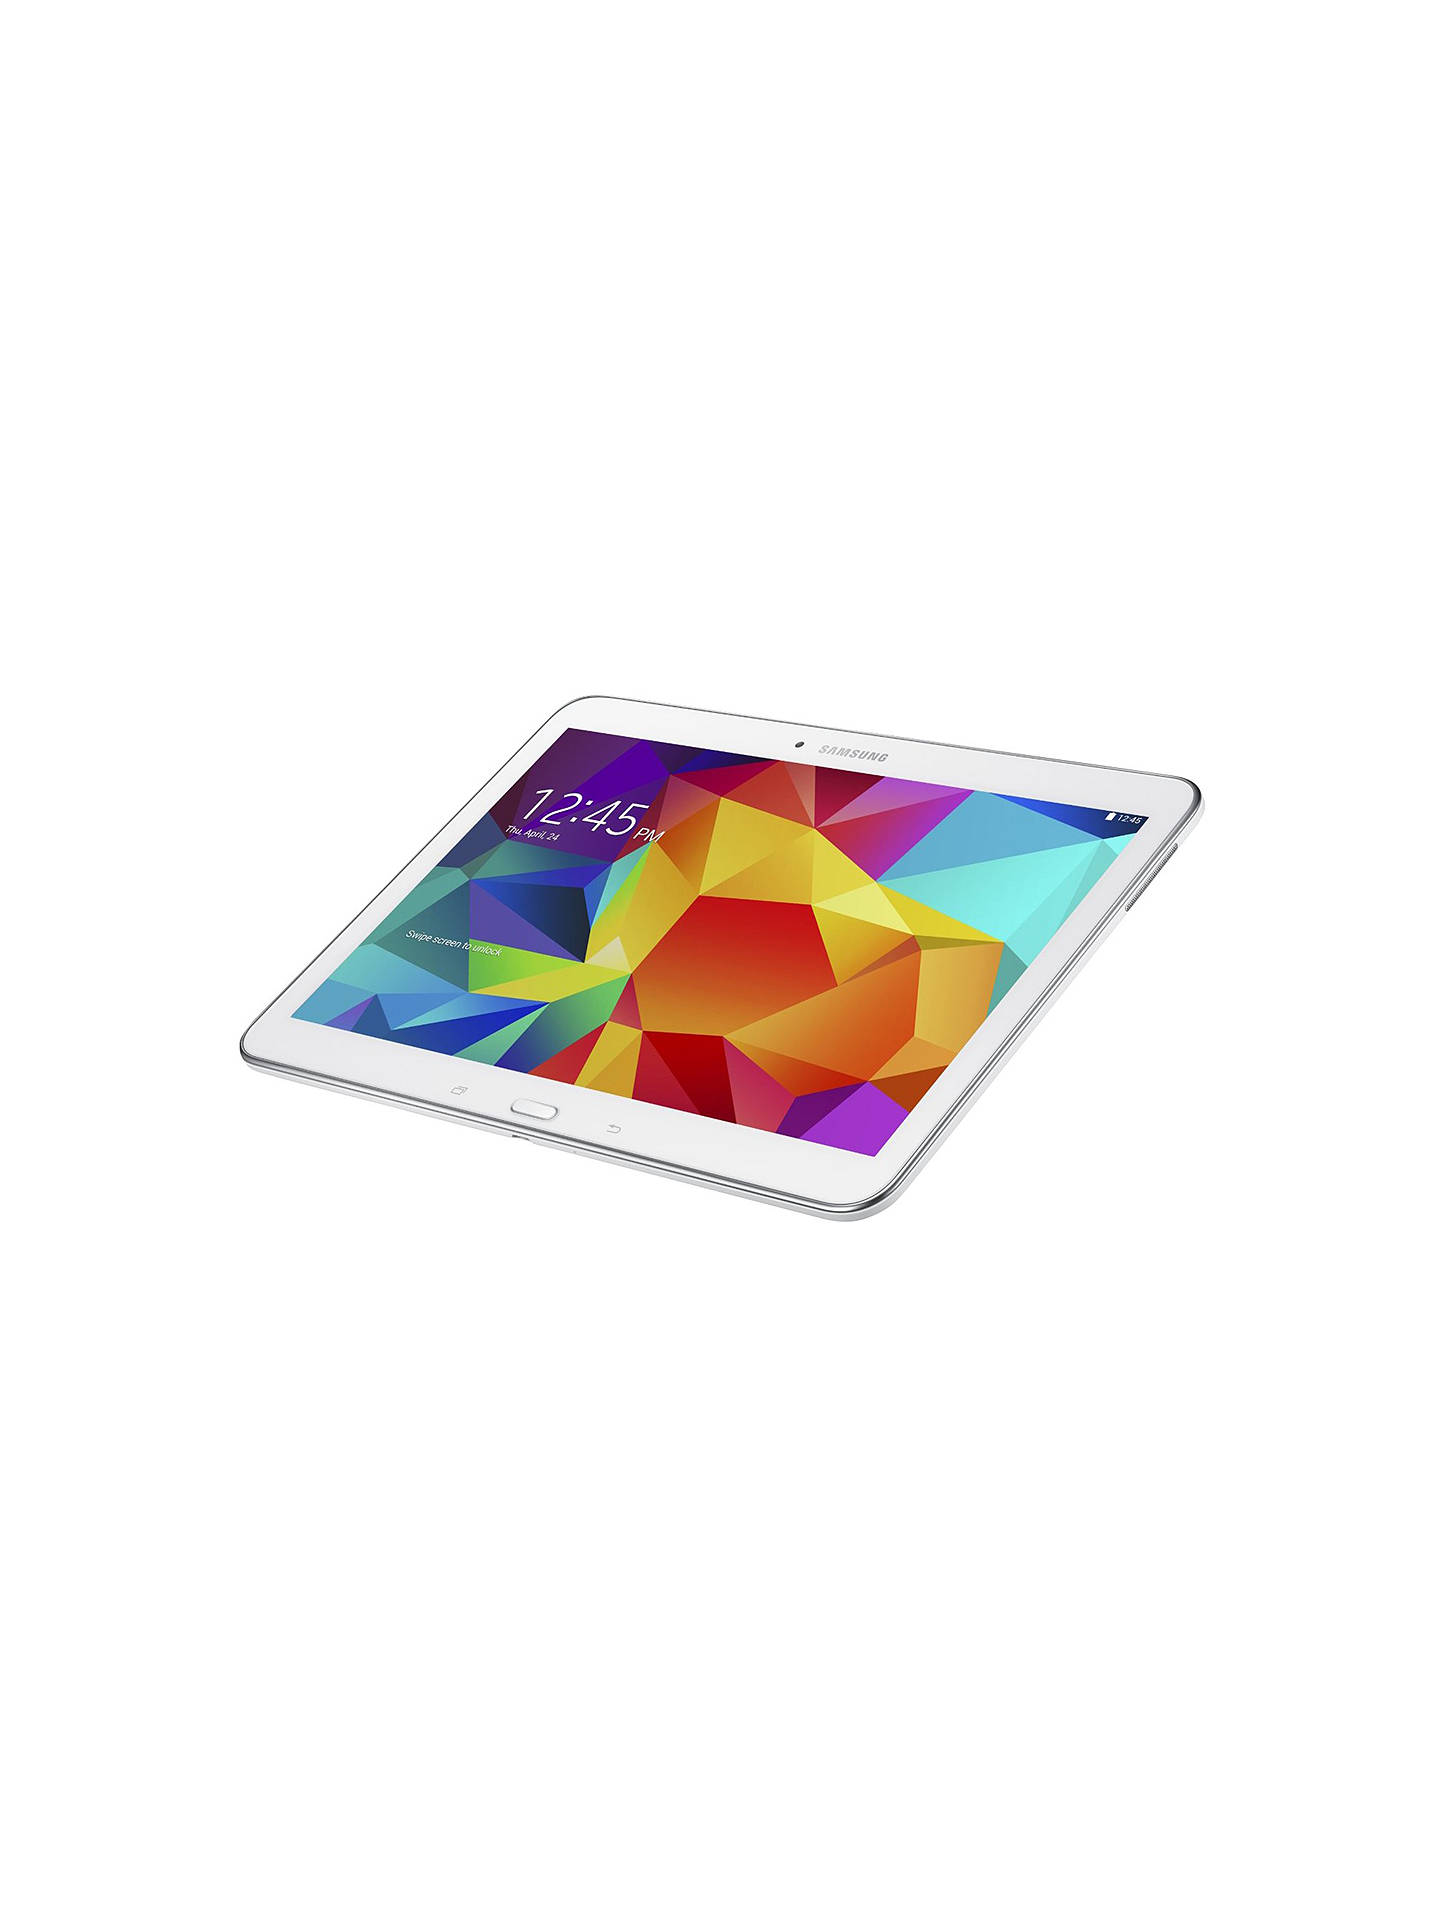 Samsung Galaxy Tab 4 10 1 Tablet, Qualcomm Snapdragon